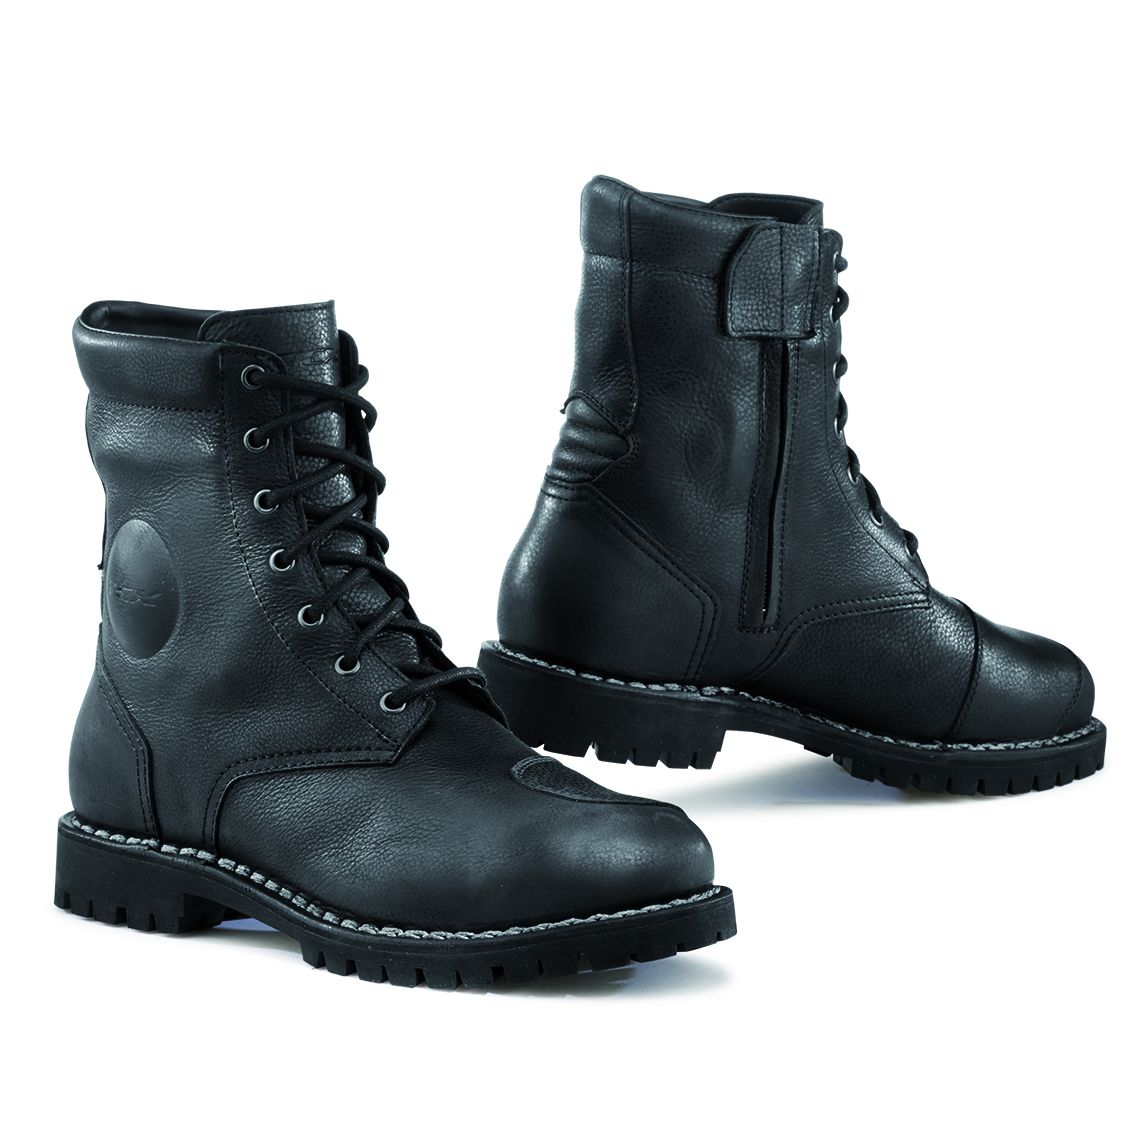 quality design b3aa7 8bf6e Scarpe TCX Boots HERO WATERPROOF